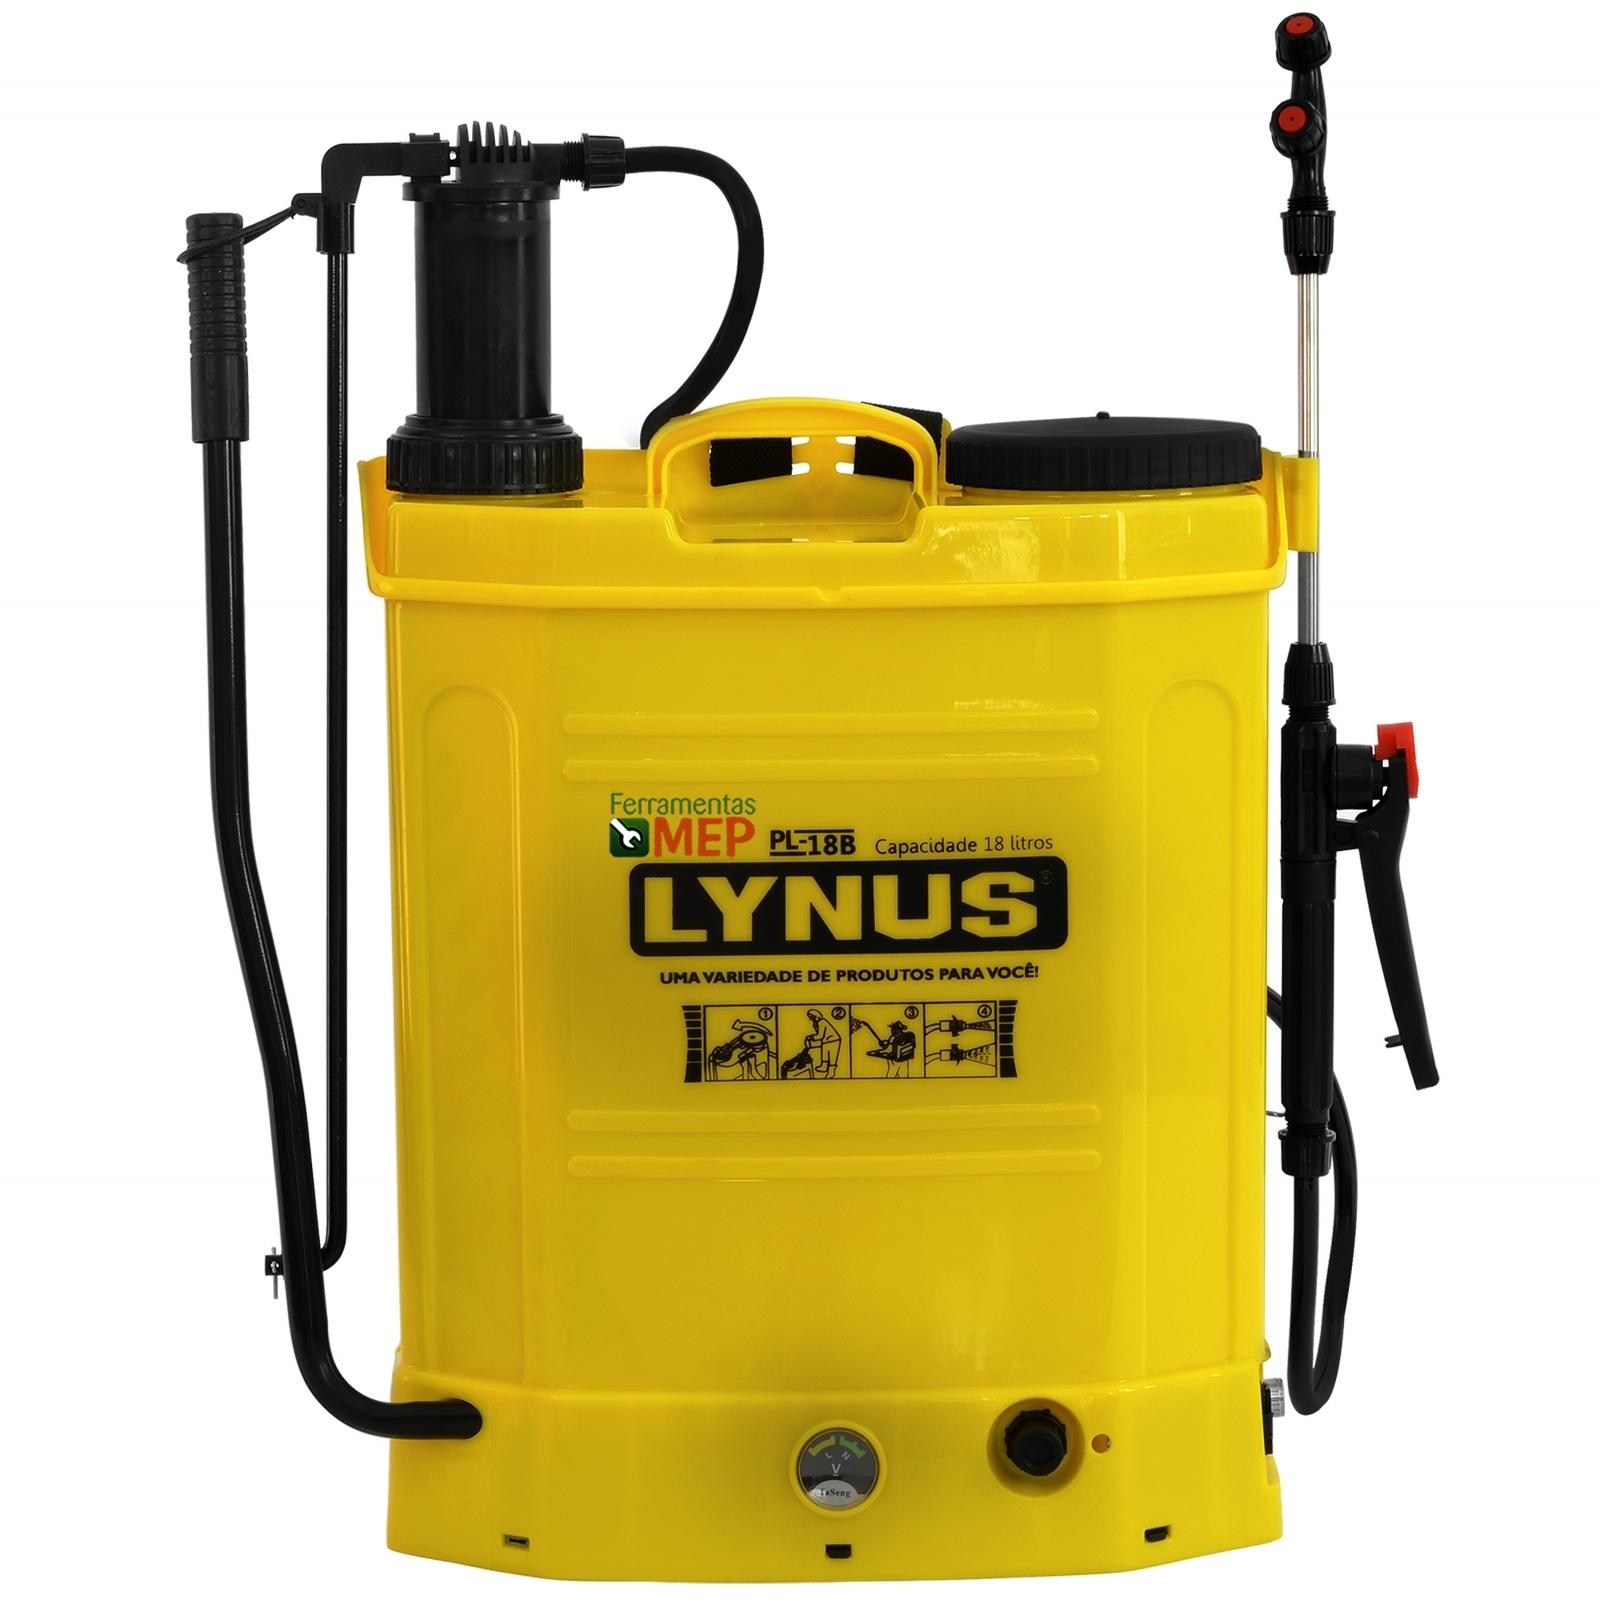 Pulverizador Costal 18 Litros Lynus PL18B Bateria e Manual Ly1 - Ferramentas MEP